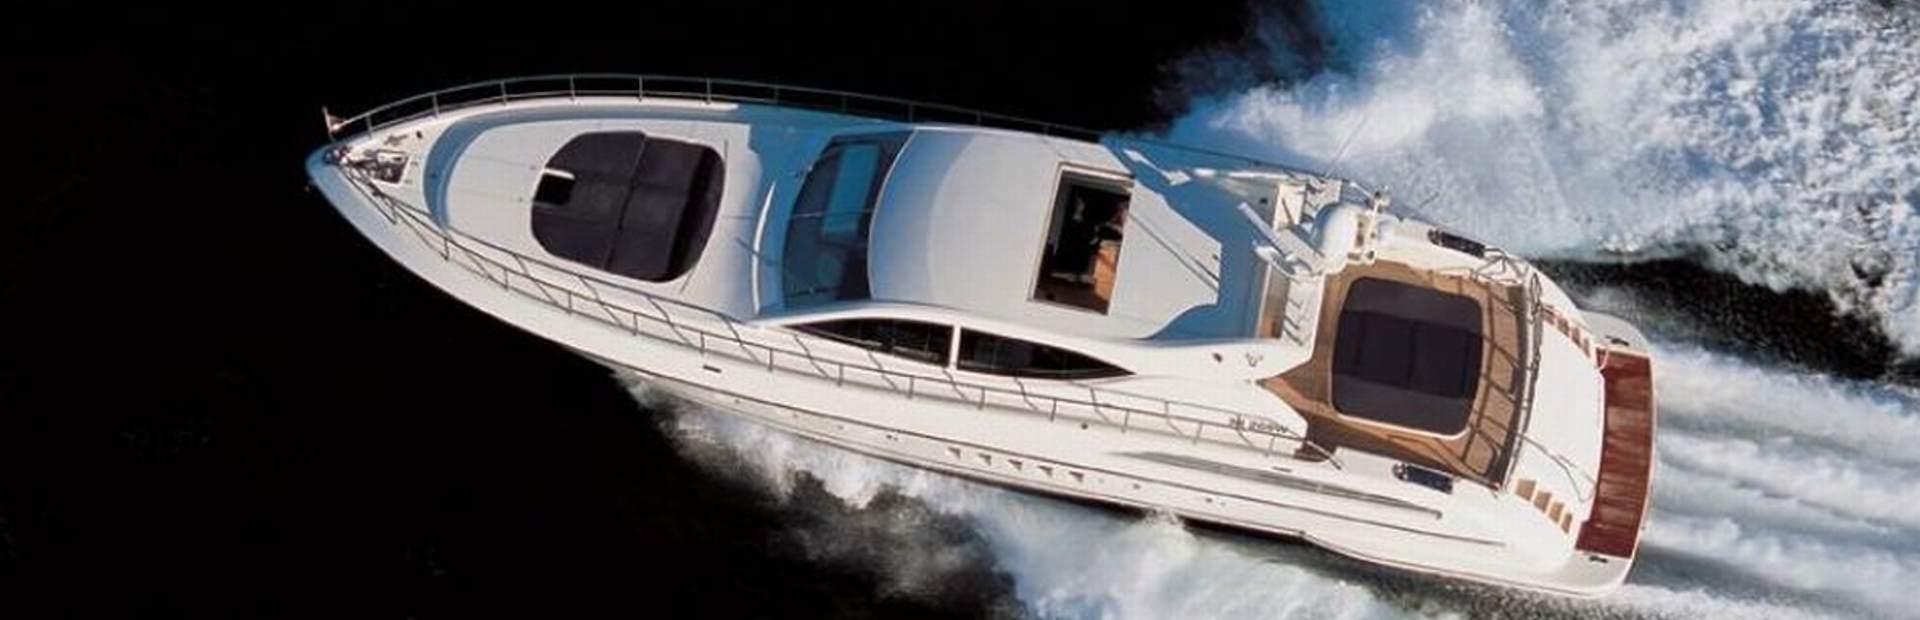 Leopard 24 Yacht Charter